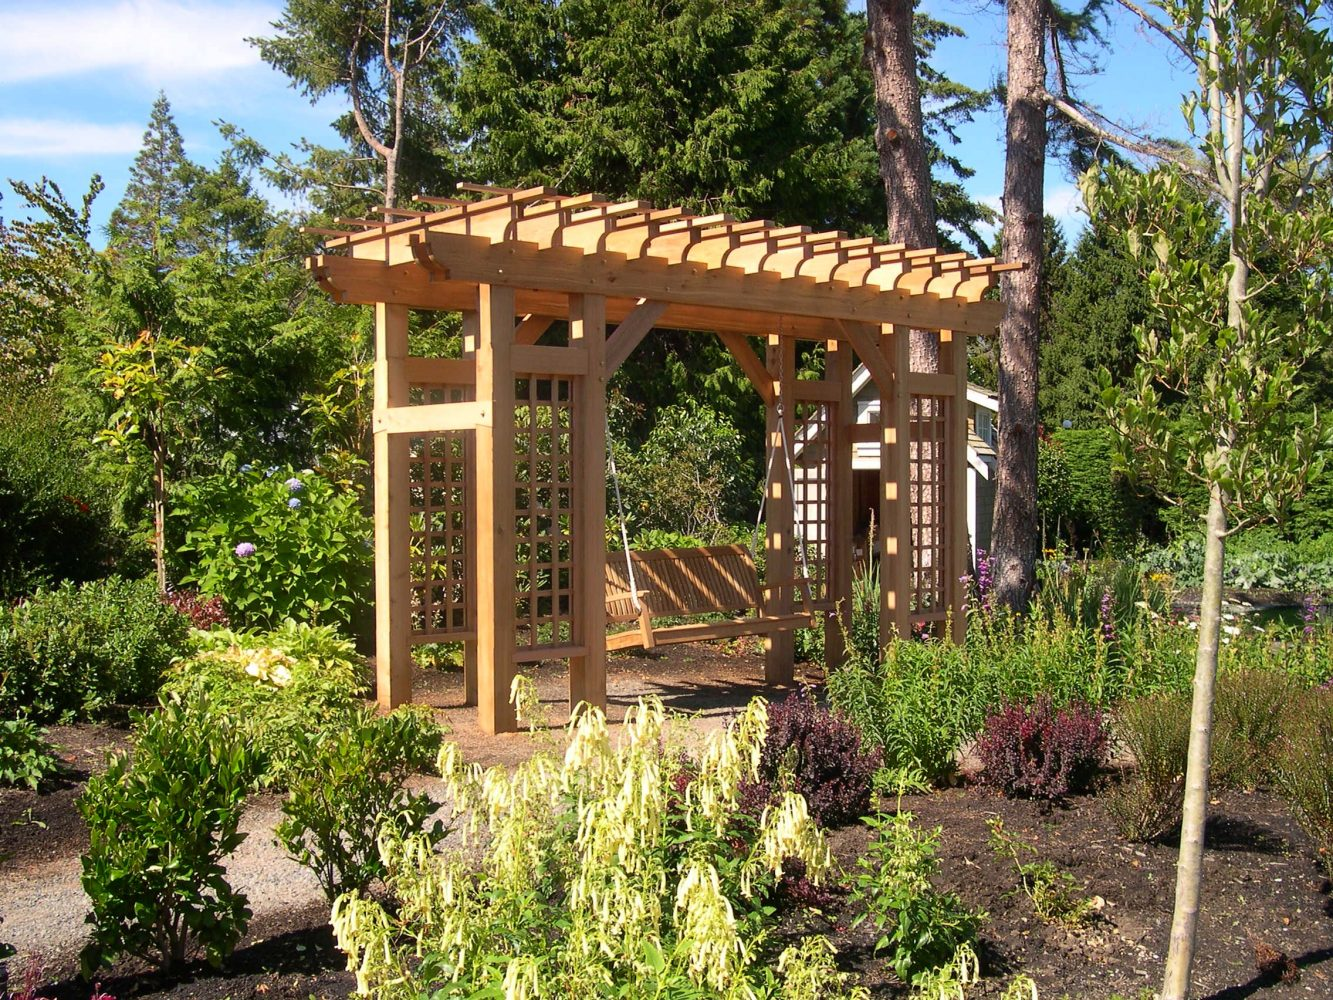 Cedar Garden arbour with swing